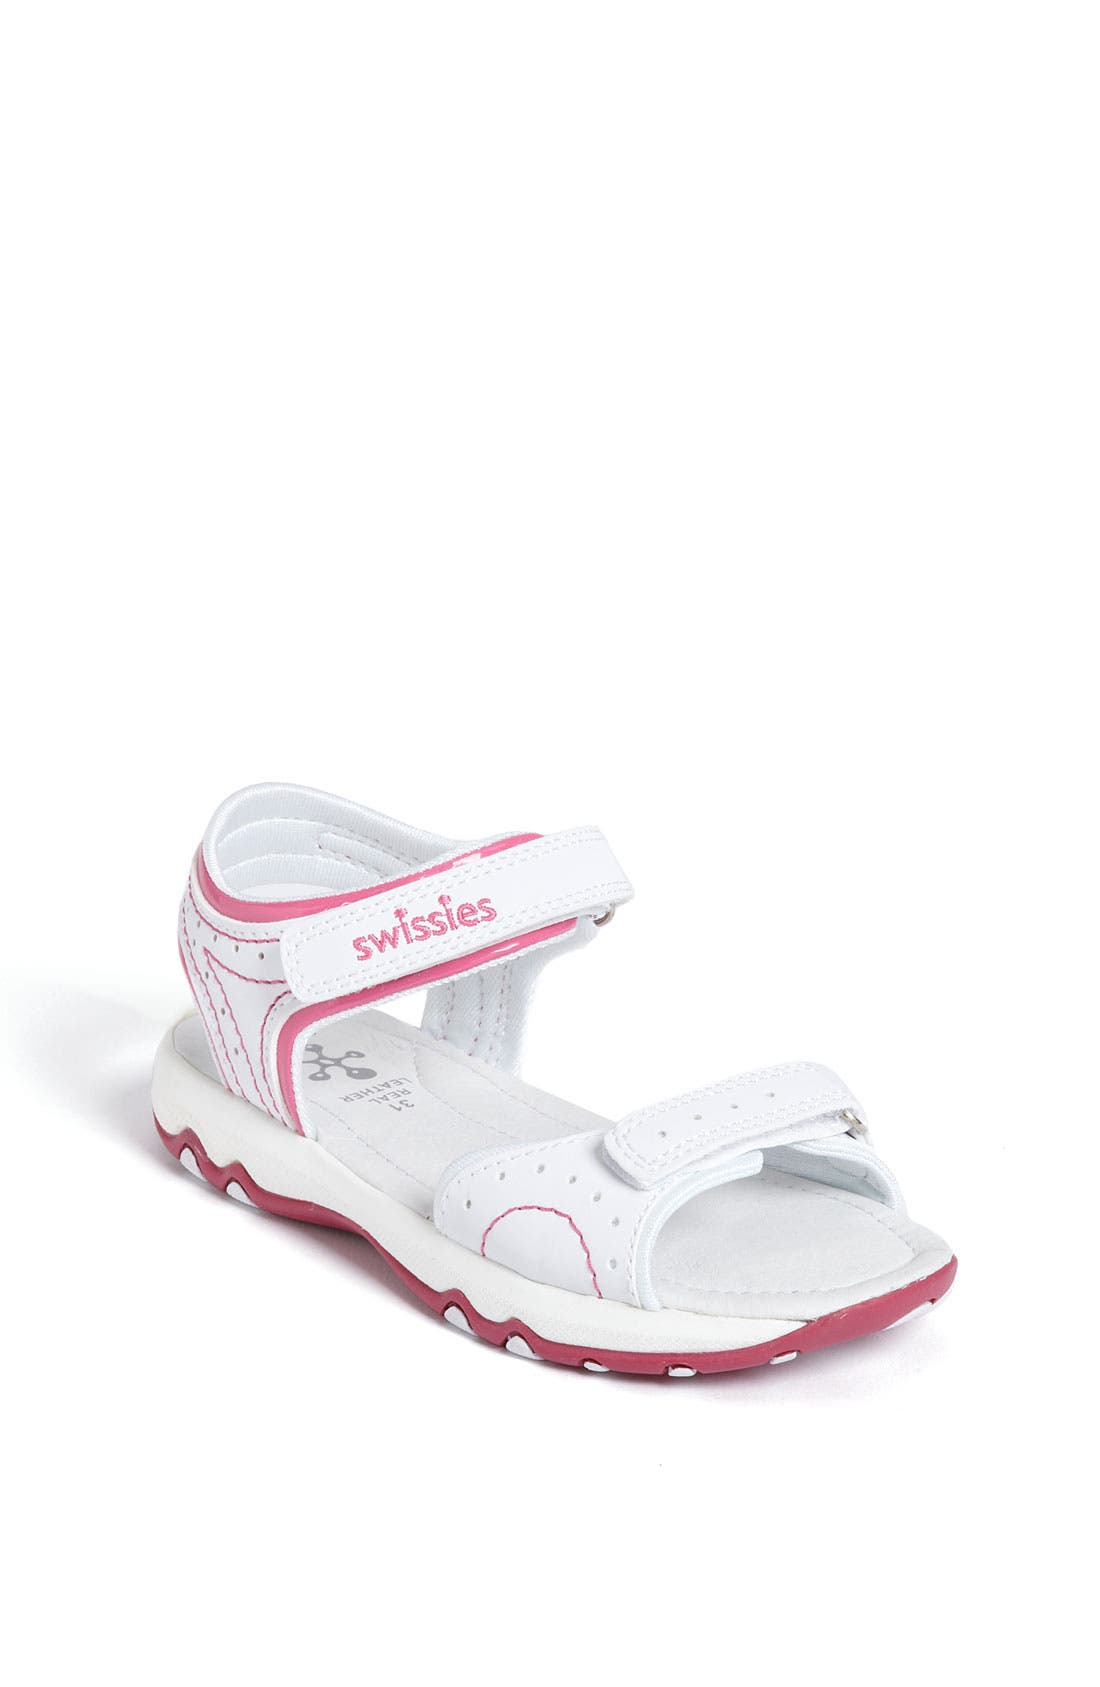 Alternate Image 1 Selected - Swissies 'Maya' Sandal (Toddler, Little Kid & Big Kid)